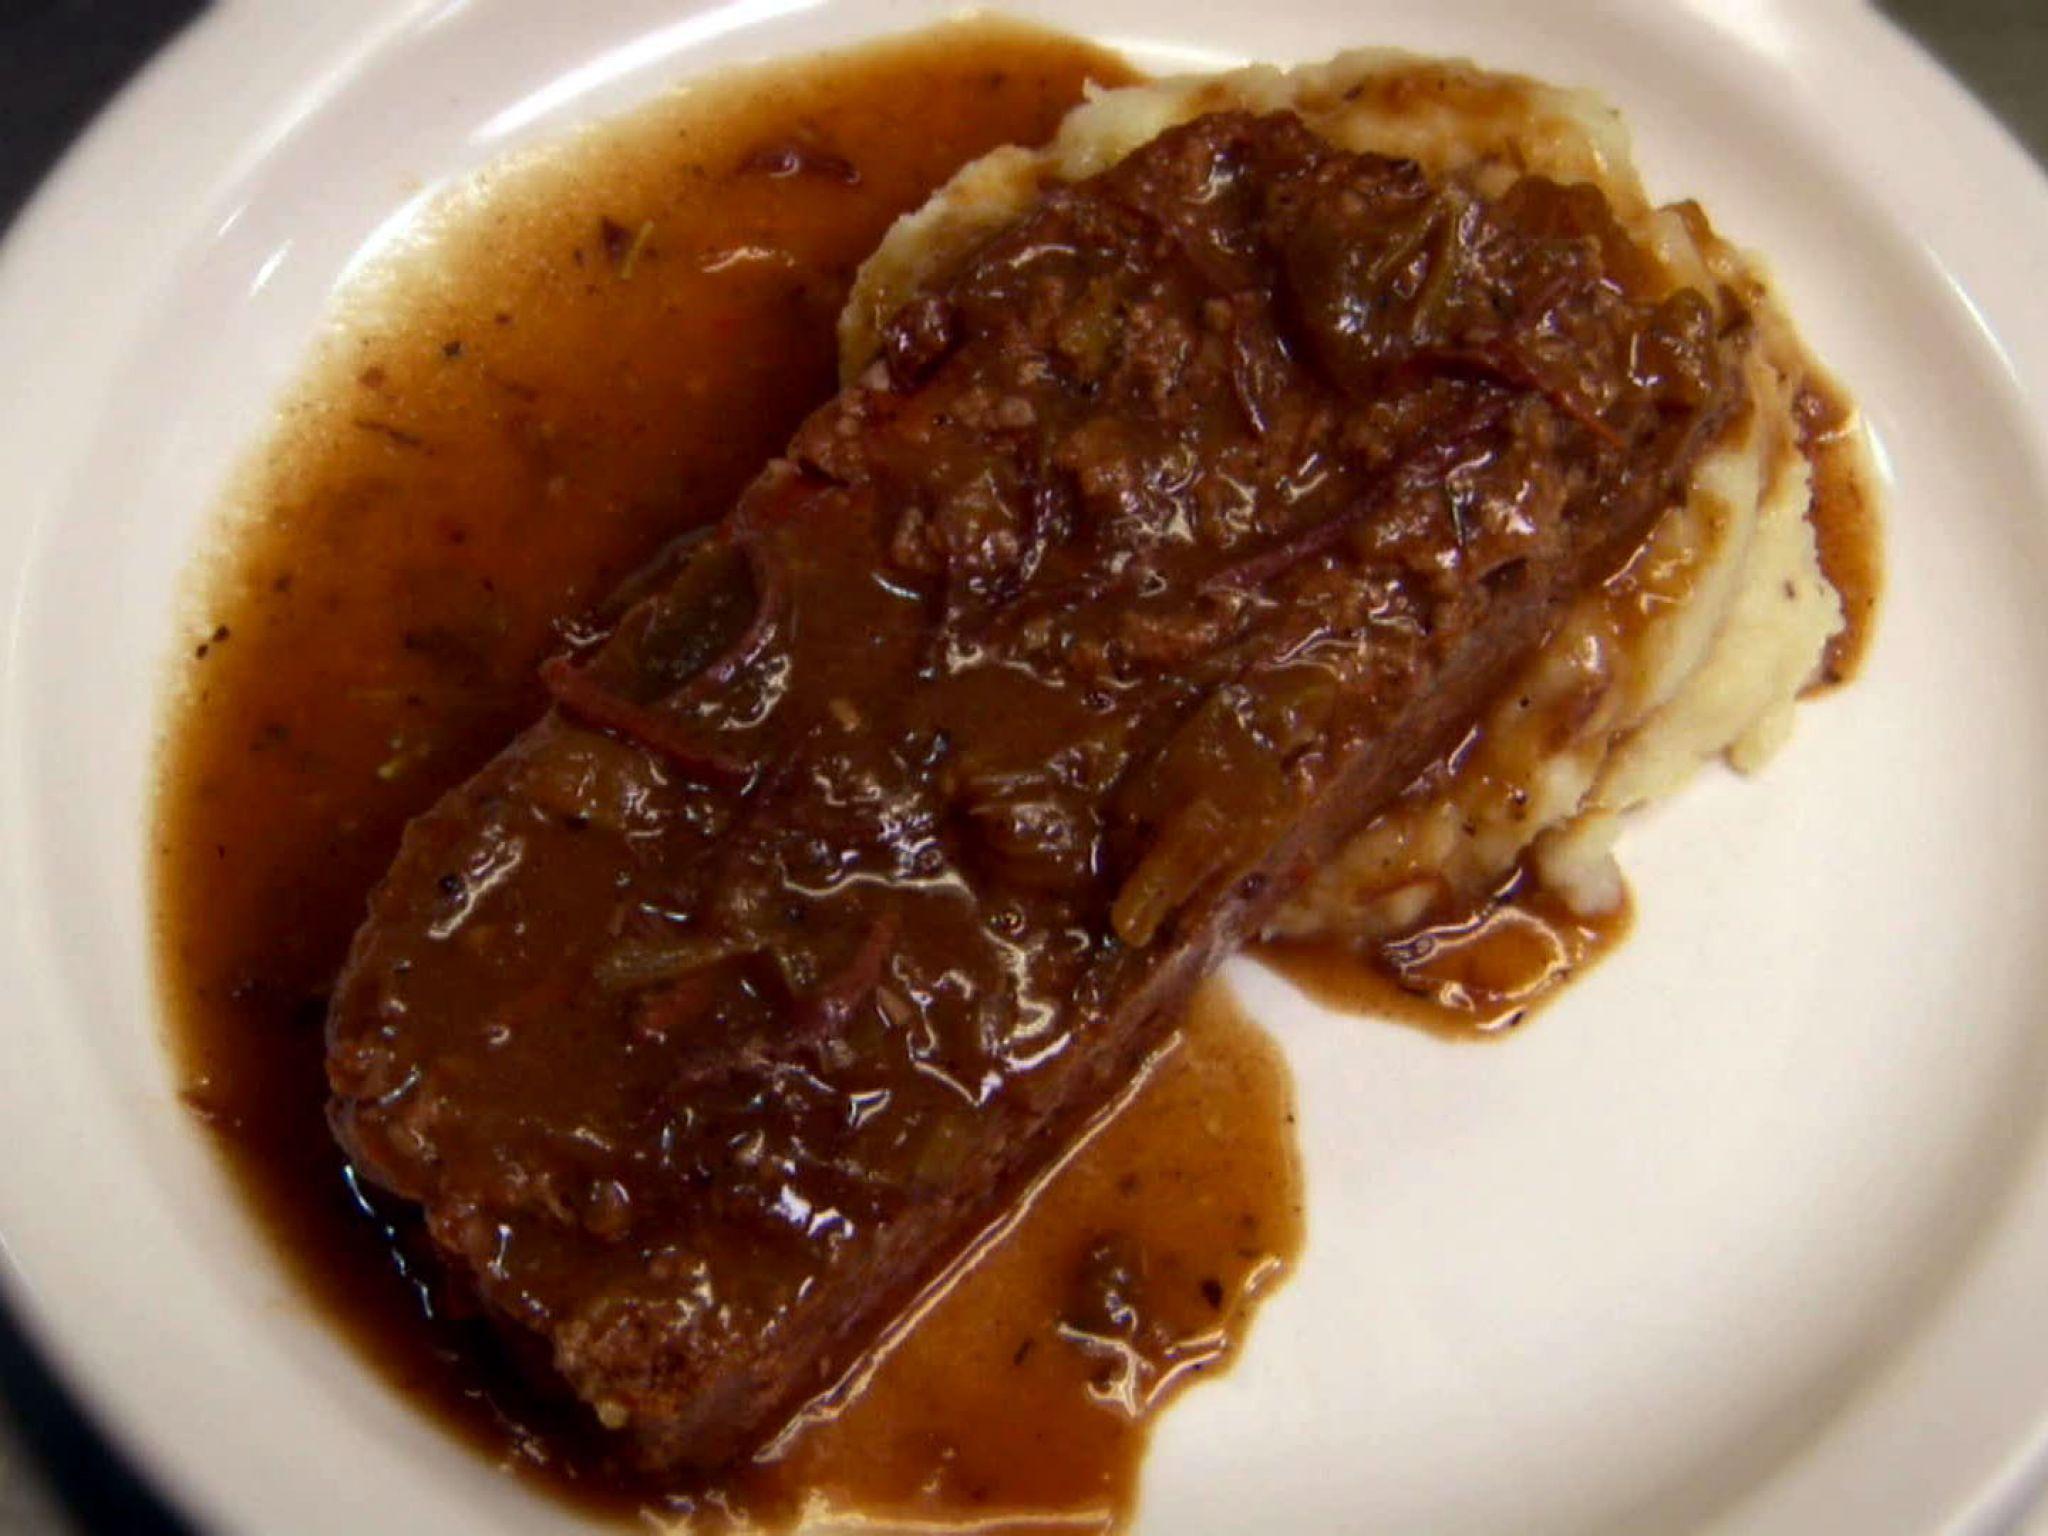 Get fresh cafe meatloaf recipe pinterest meatloaf recipes get fresh cafe meatloaf recipe from diners drive ins and dives via food network forumfinder Gallery